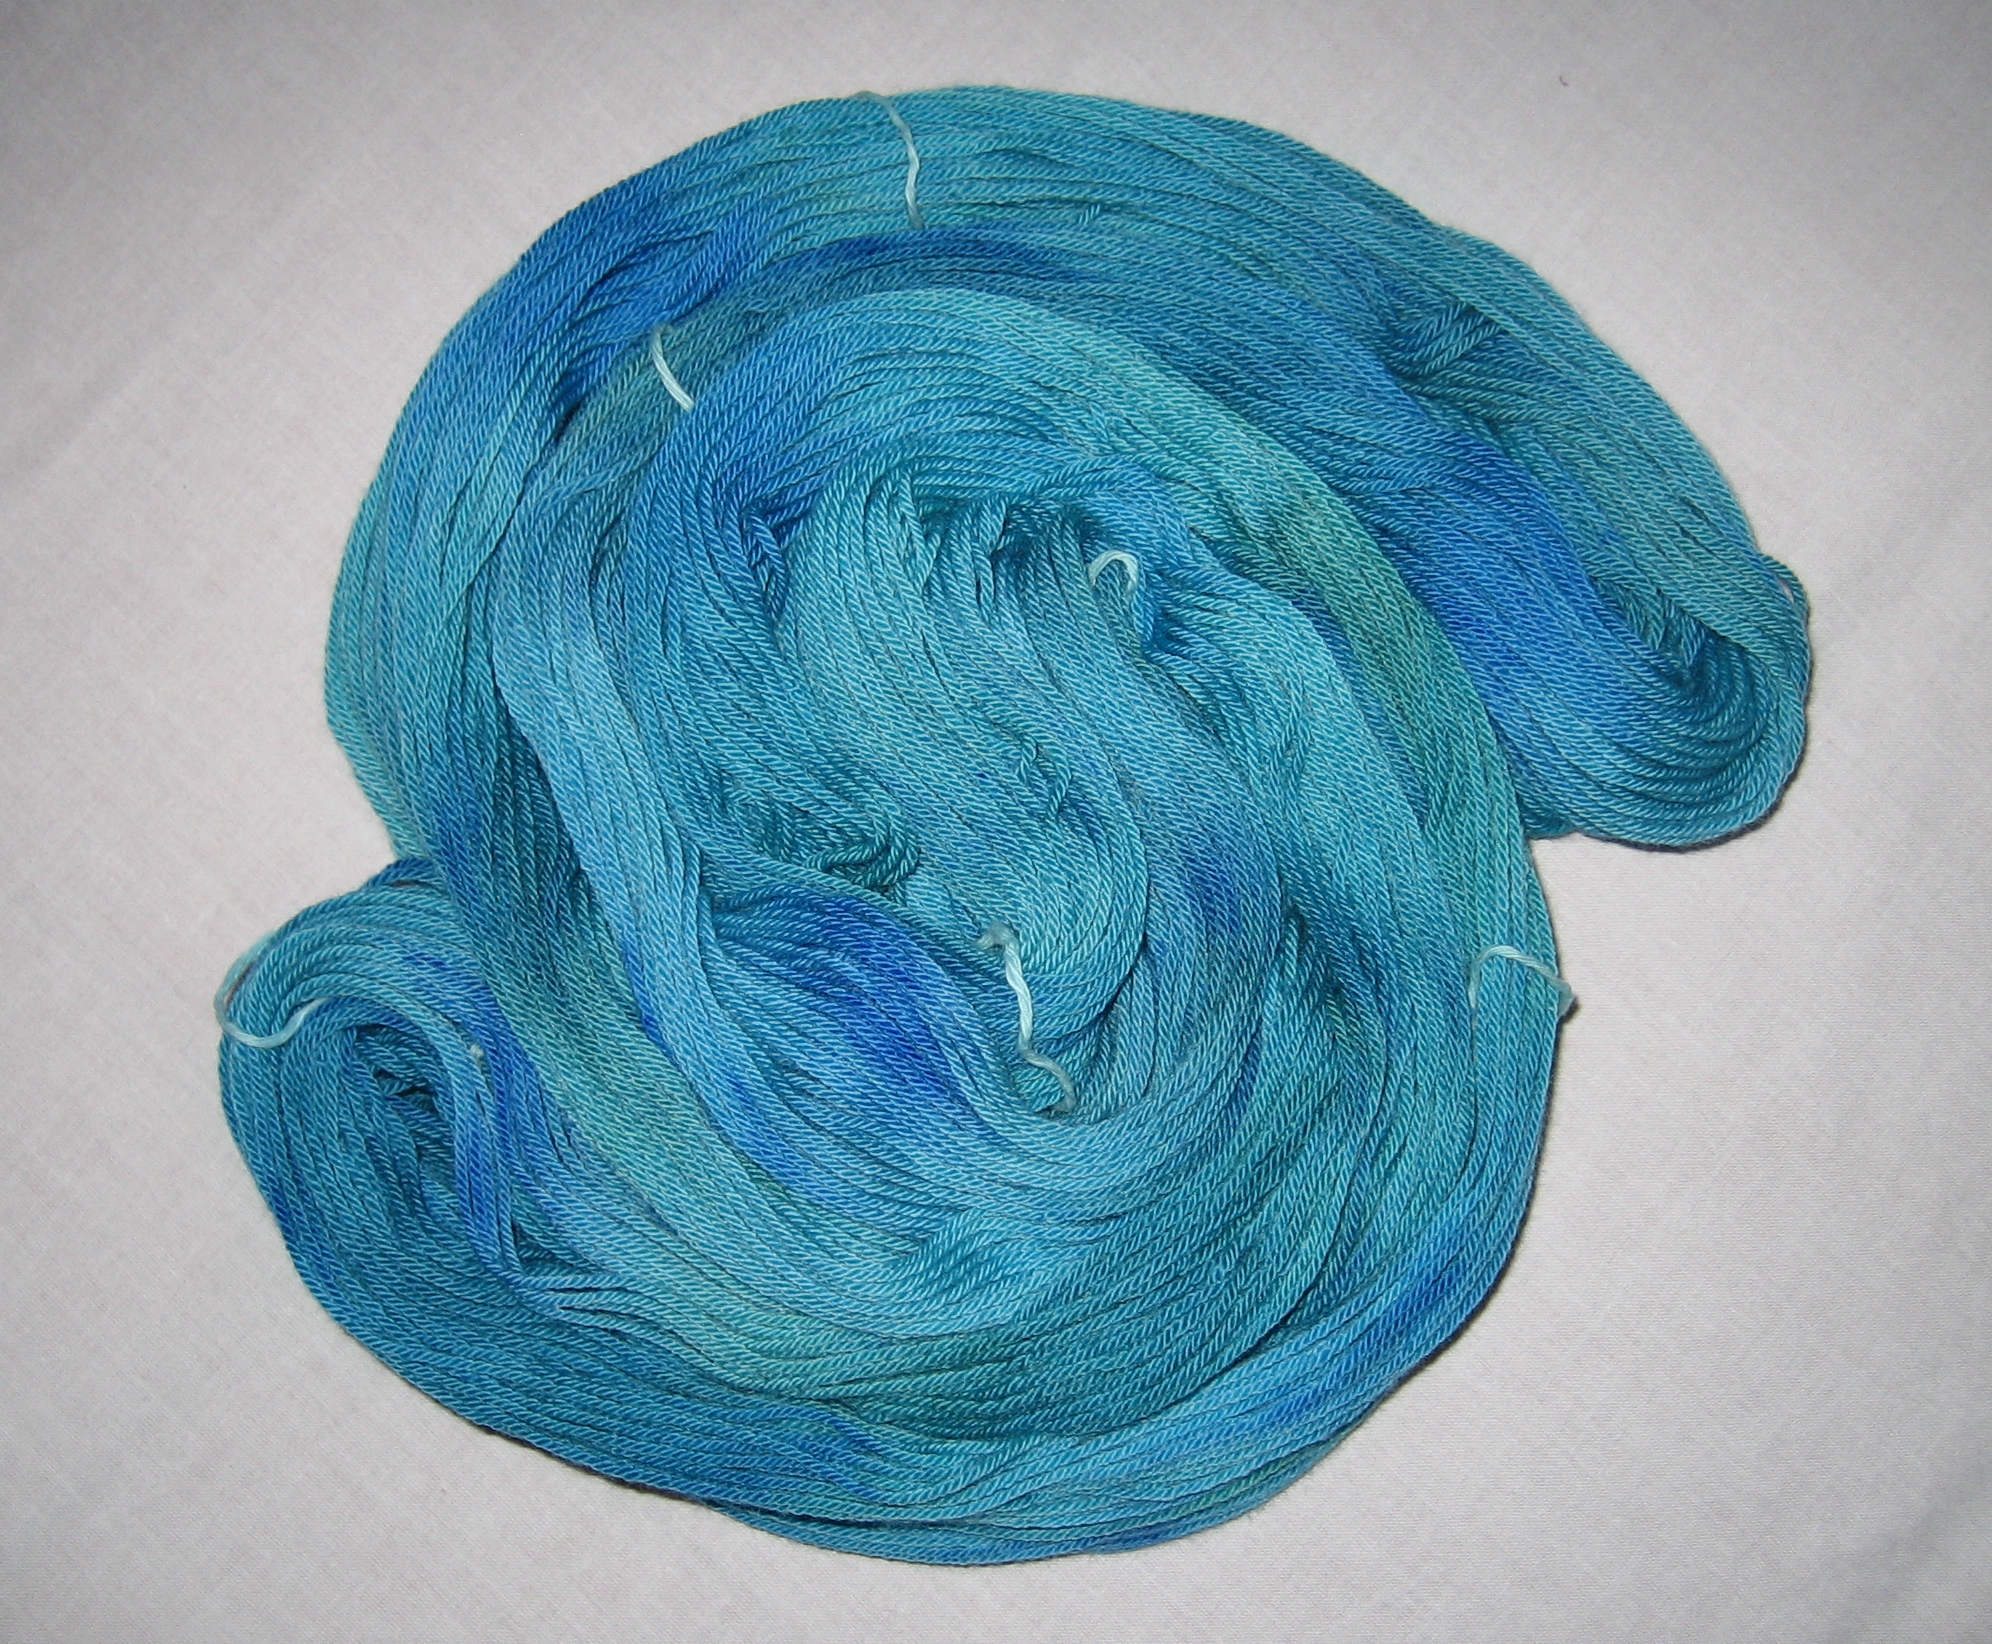 garnyarn-håndfarvet-garn-mellem-merinould-baeredygtig-blaagroen